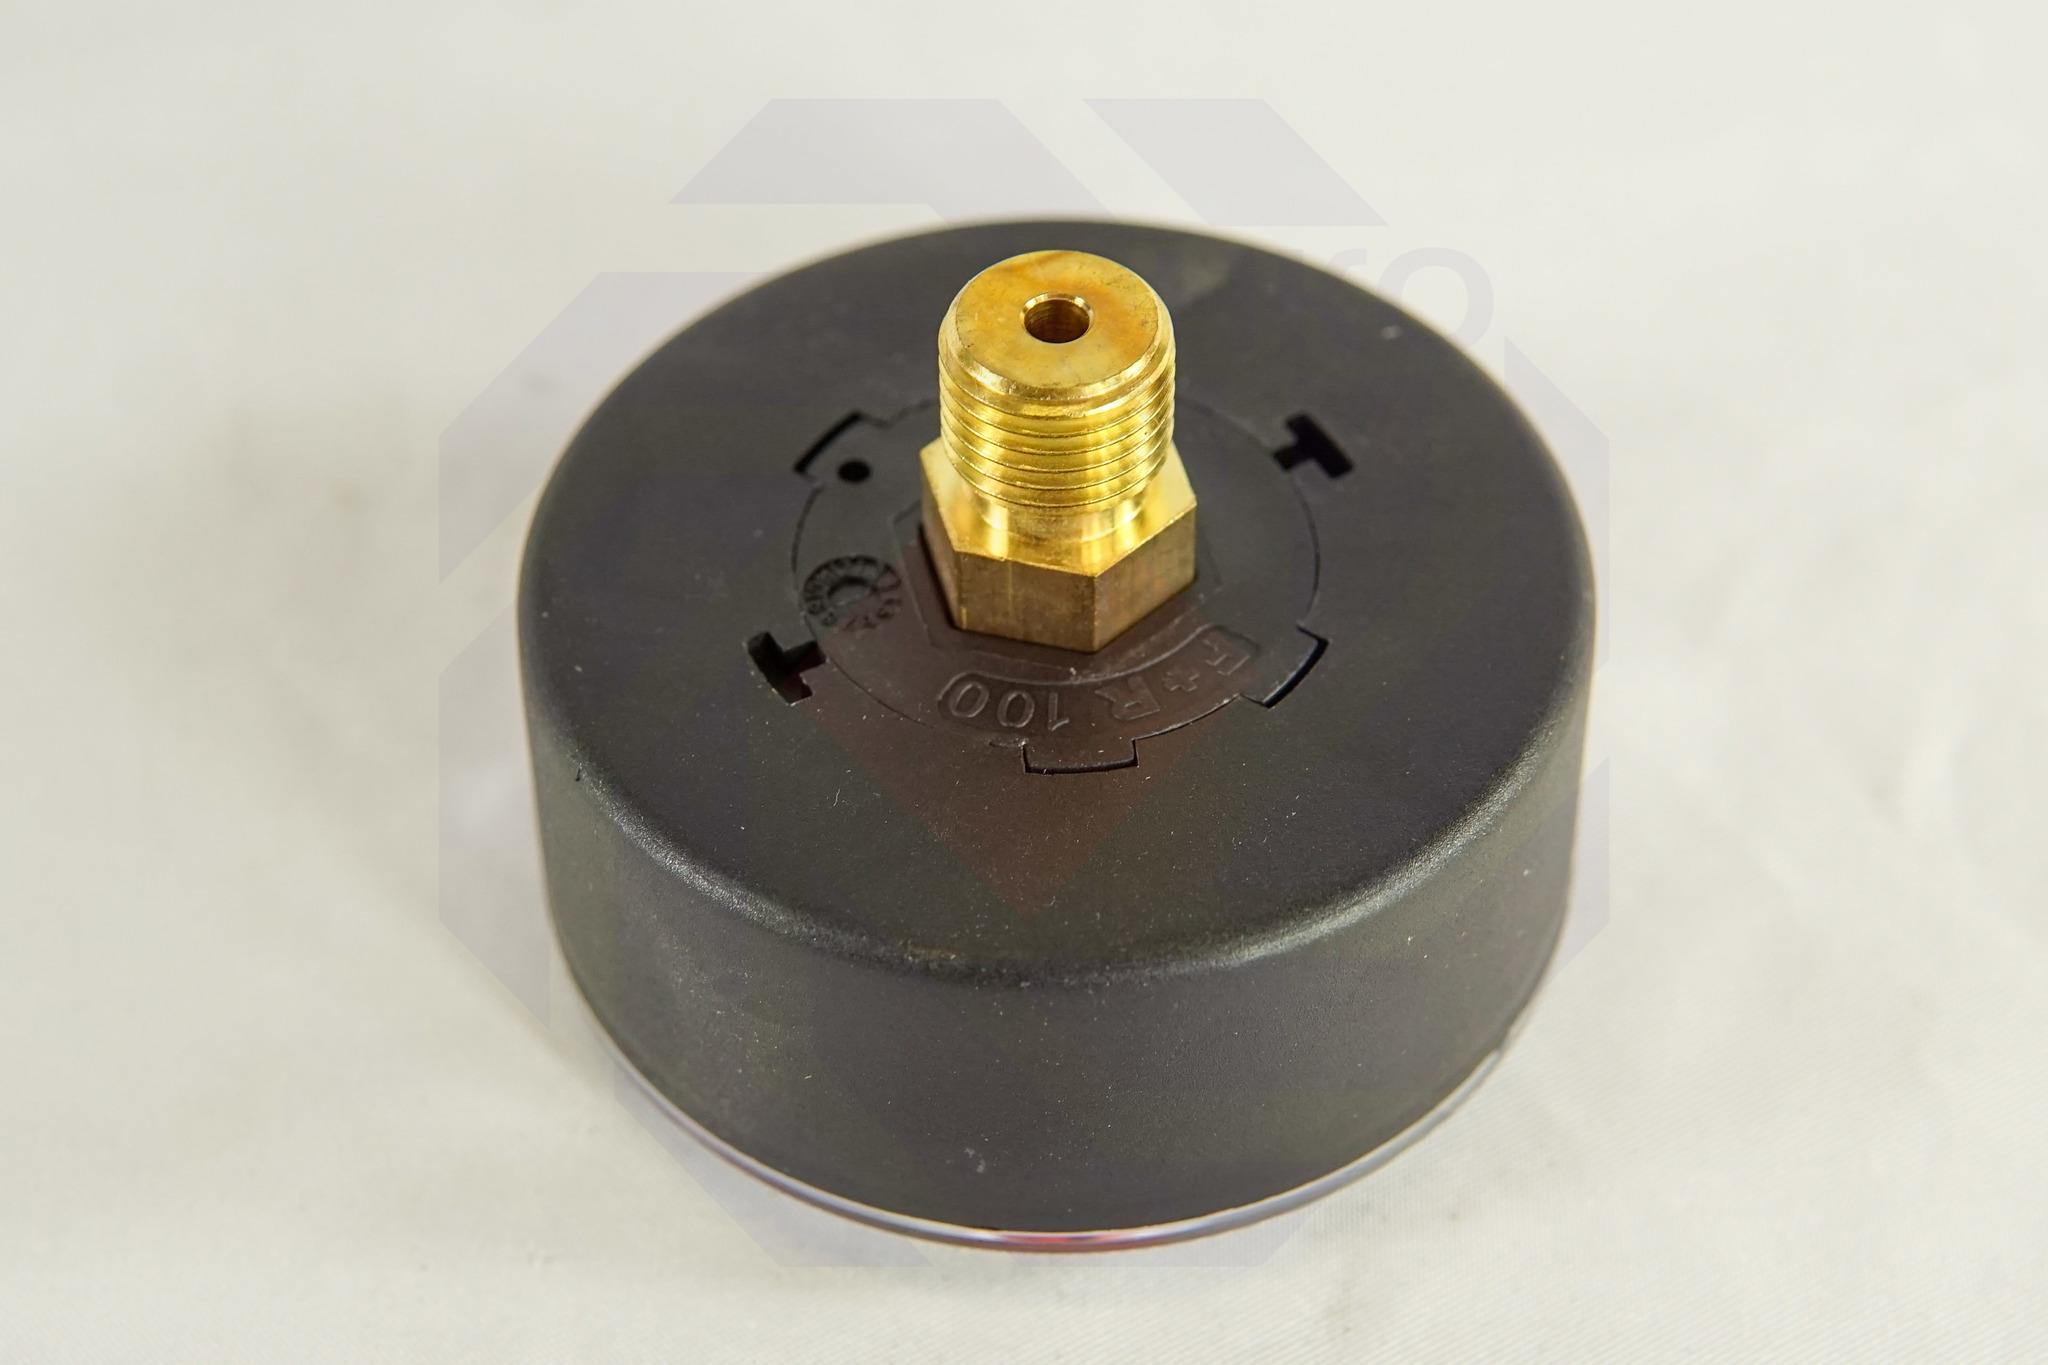 Манометр аксиальный WATTS MHA 63/4 (F+R101) 0-4 бар 63 мм ¼